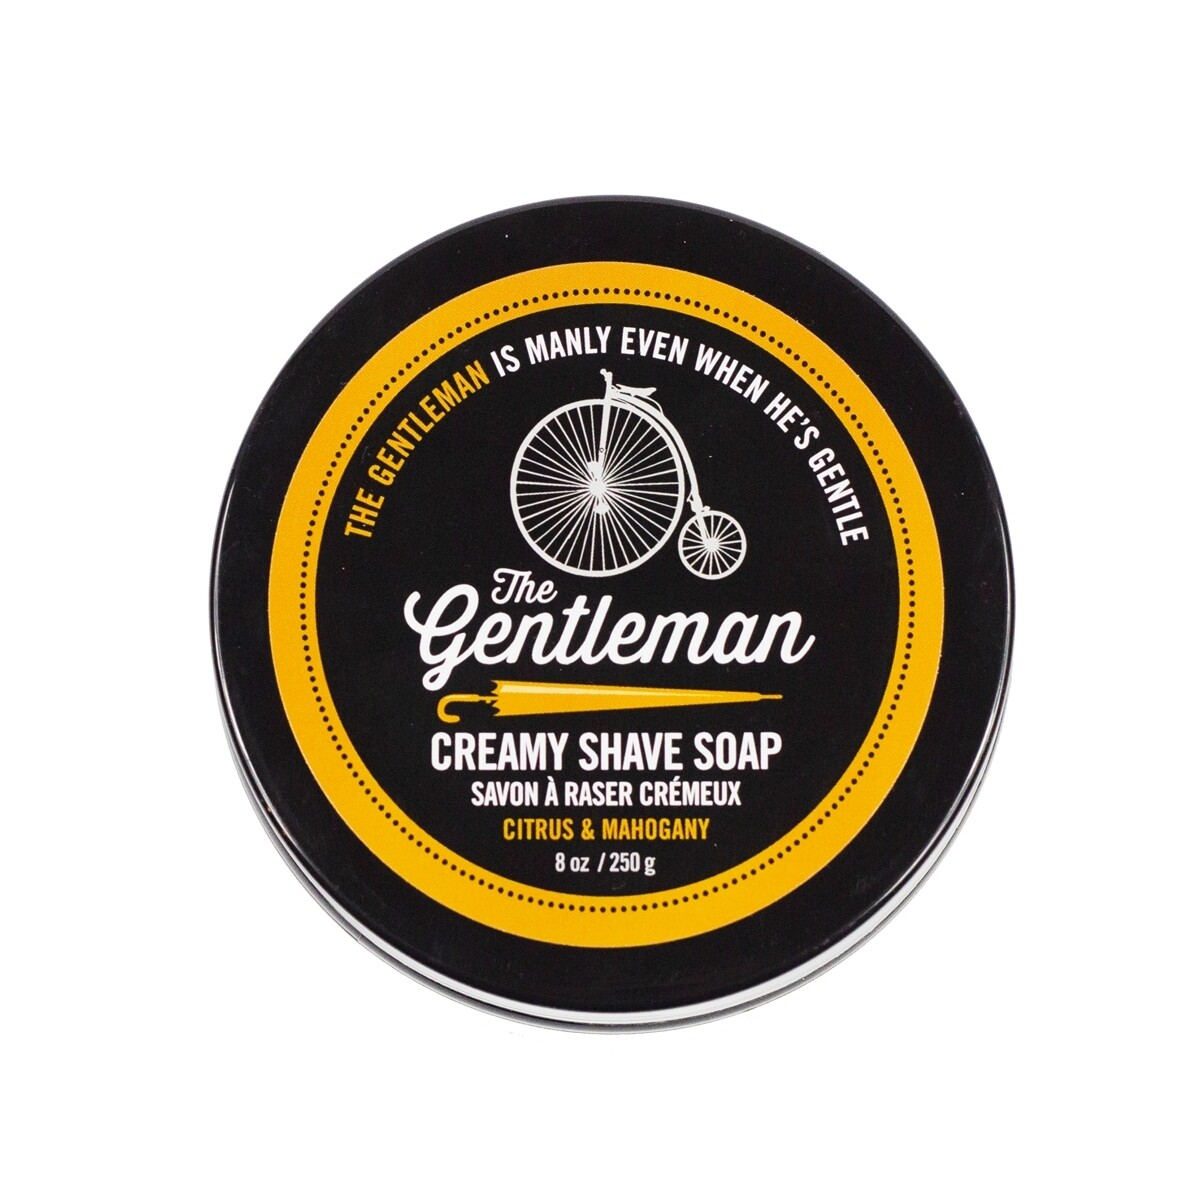 The Gentleman - Creamy Shave Soap